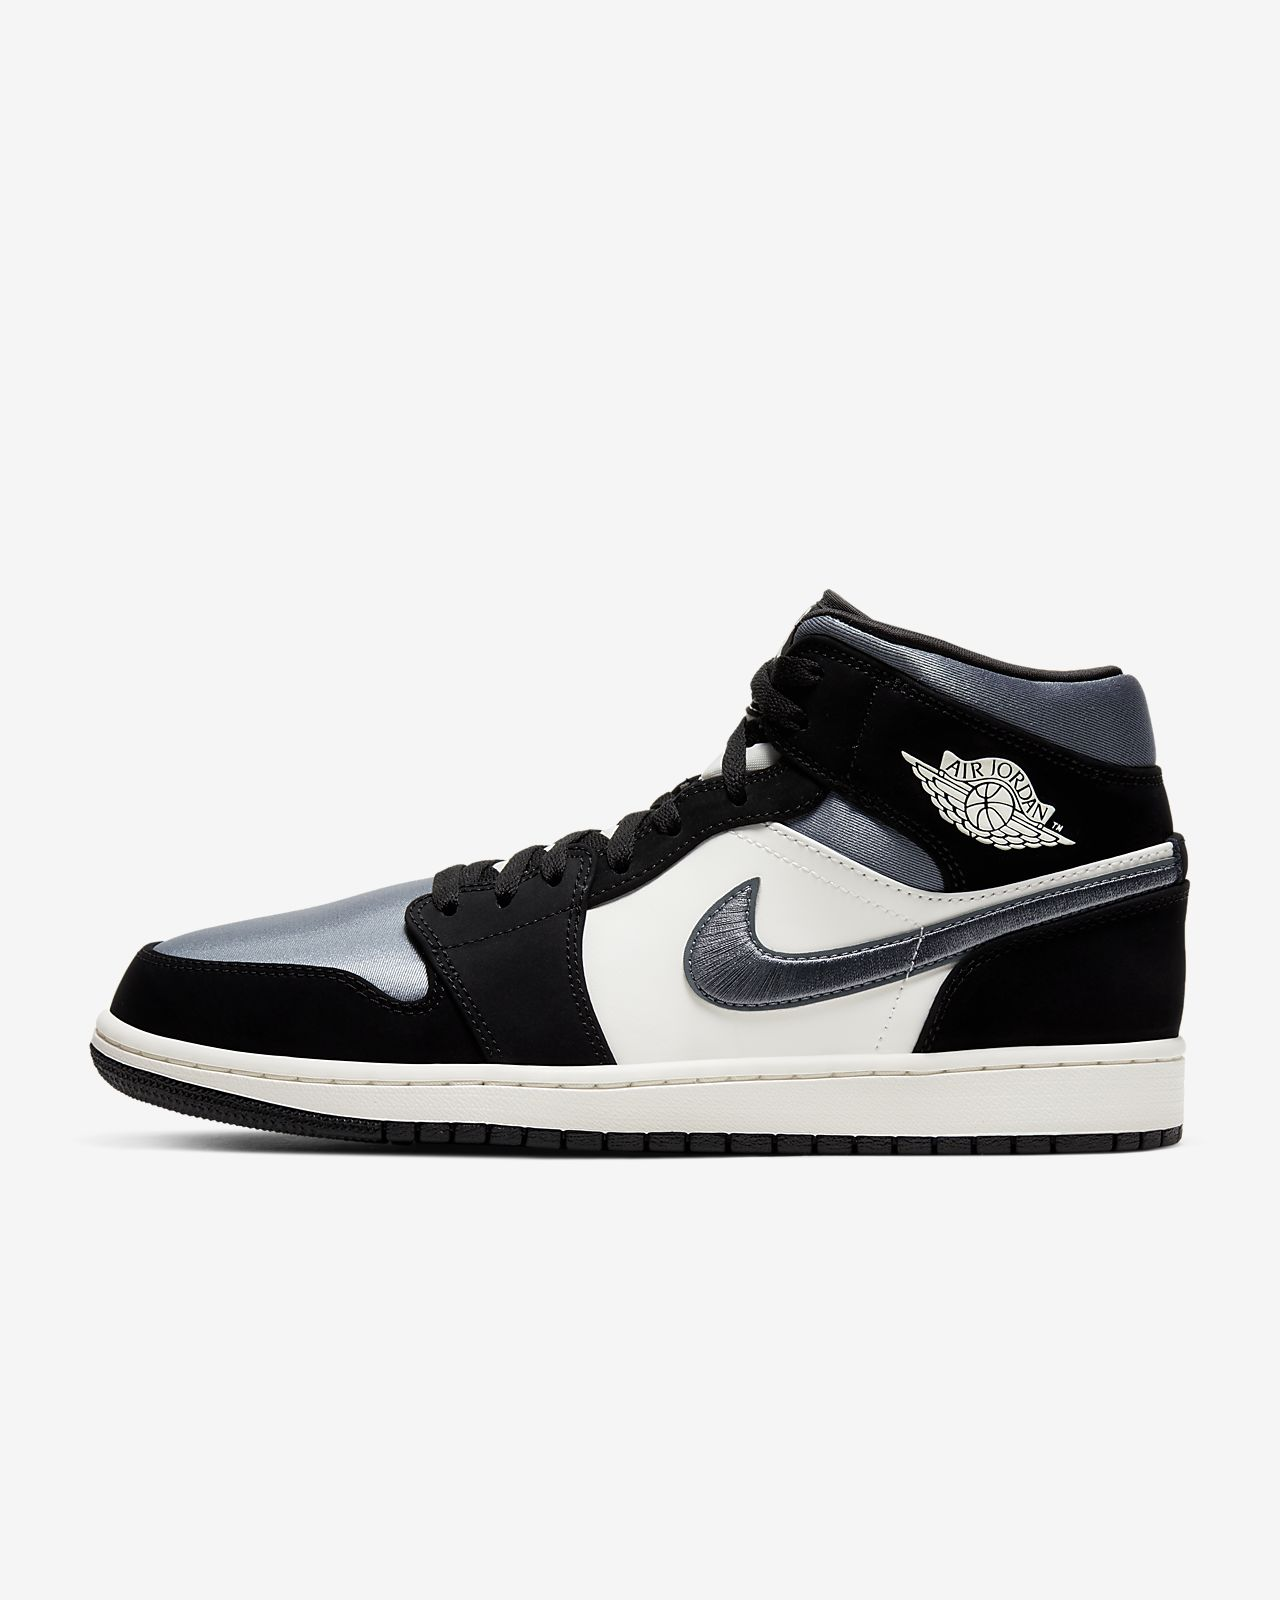 Jordan Skor 2019 2019 Kvinna All Svart Nike Skor Man Jordan